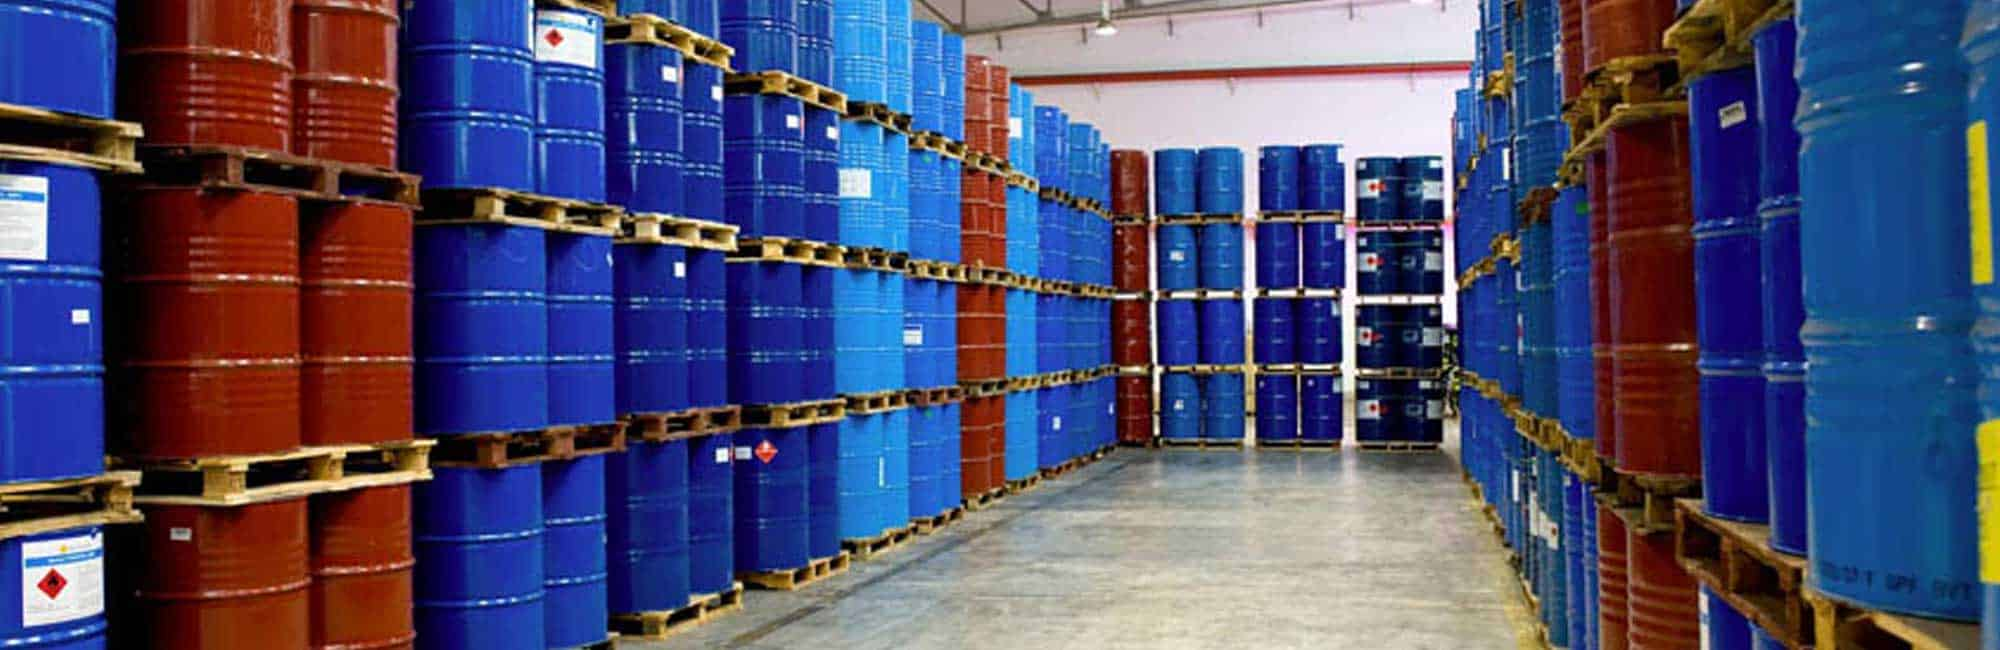 zhonglan industry ware house